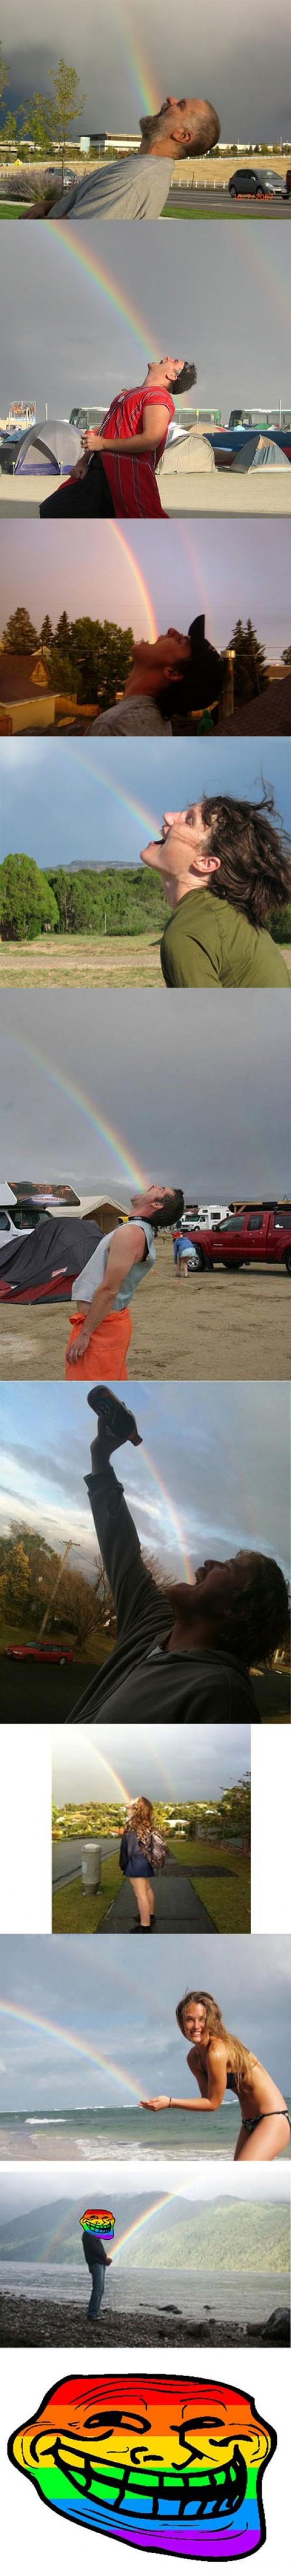 Puke_rainbows - Piss rainbows